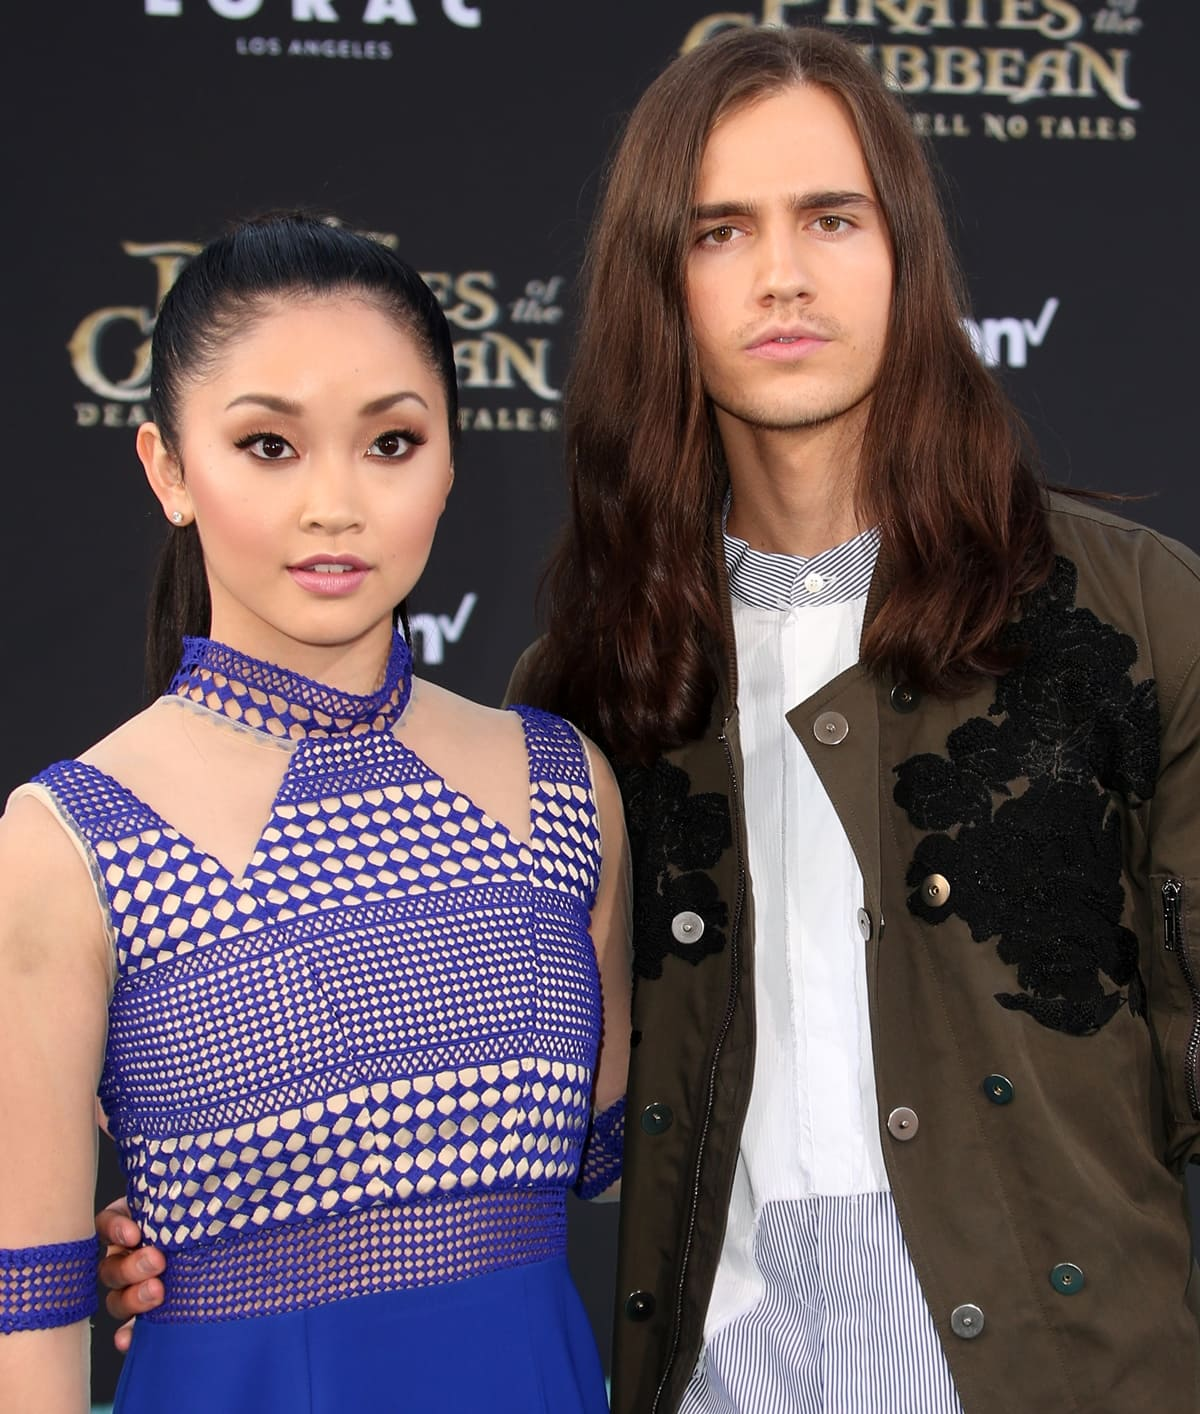 Lana Condor met her boyfriend Anthony De La Torre in 2015 at an Emmy nominees reception in Beverly Hills